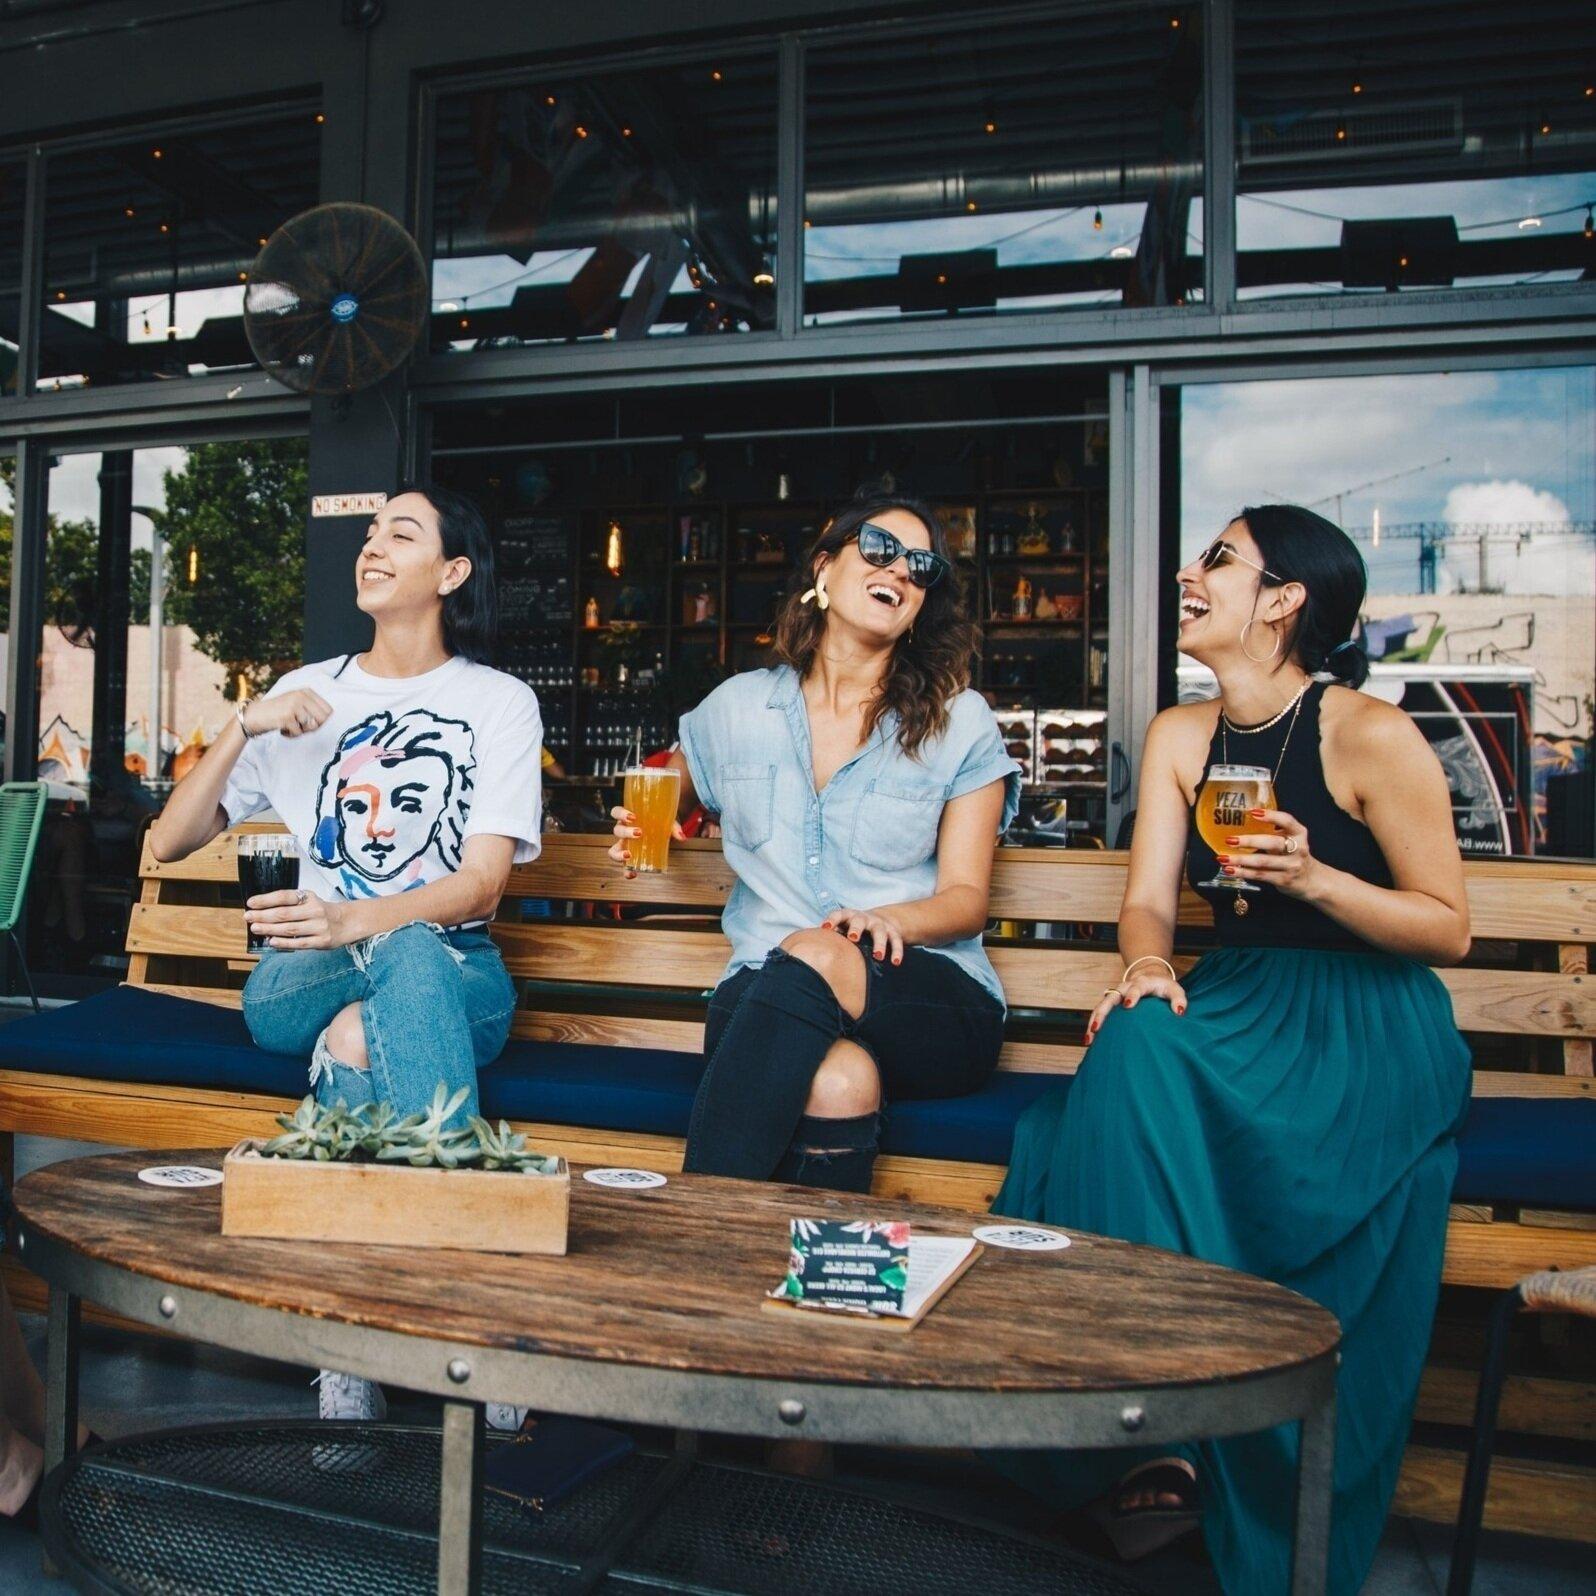 adults-alcoholic-beverages-bar-1267697.jpg